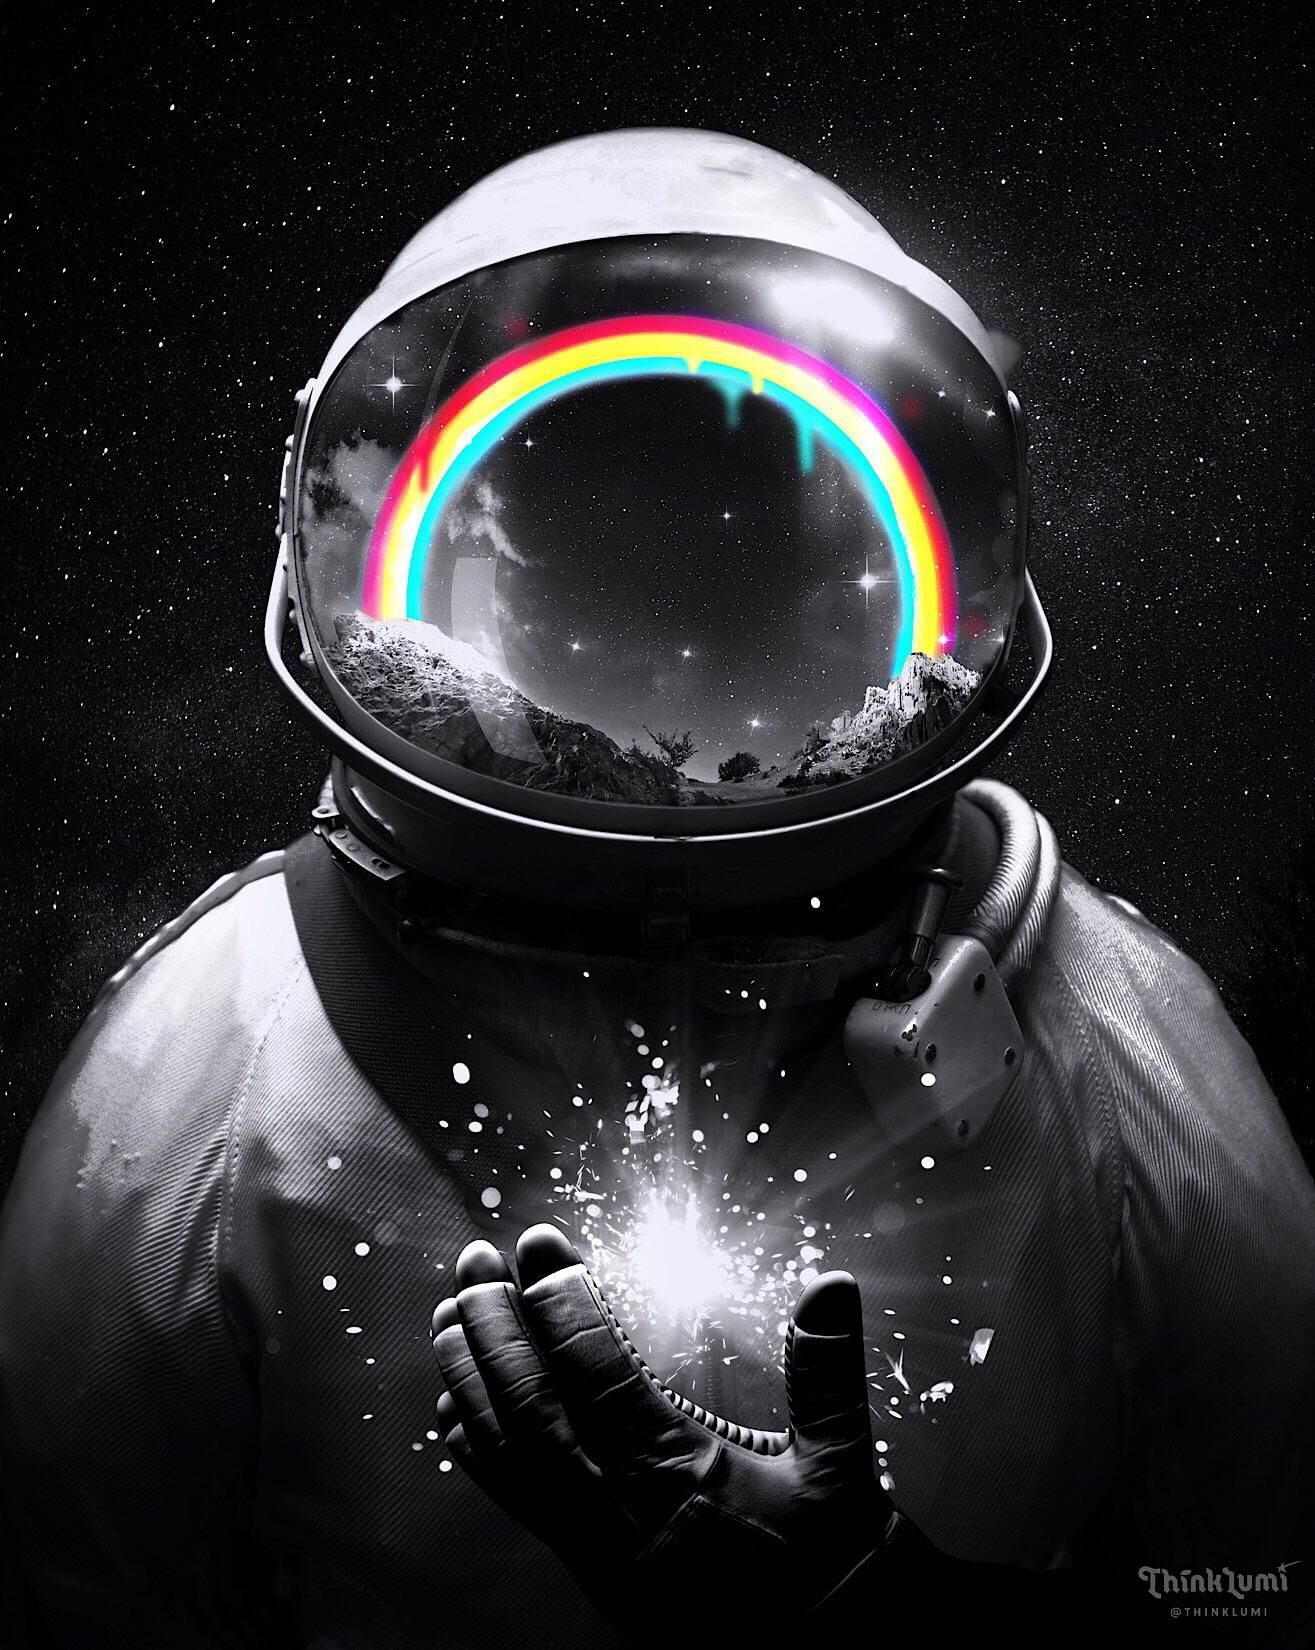 Cosmic Hope, Me, Digital, 2019